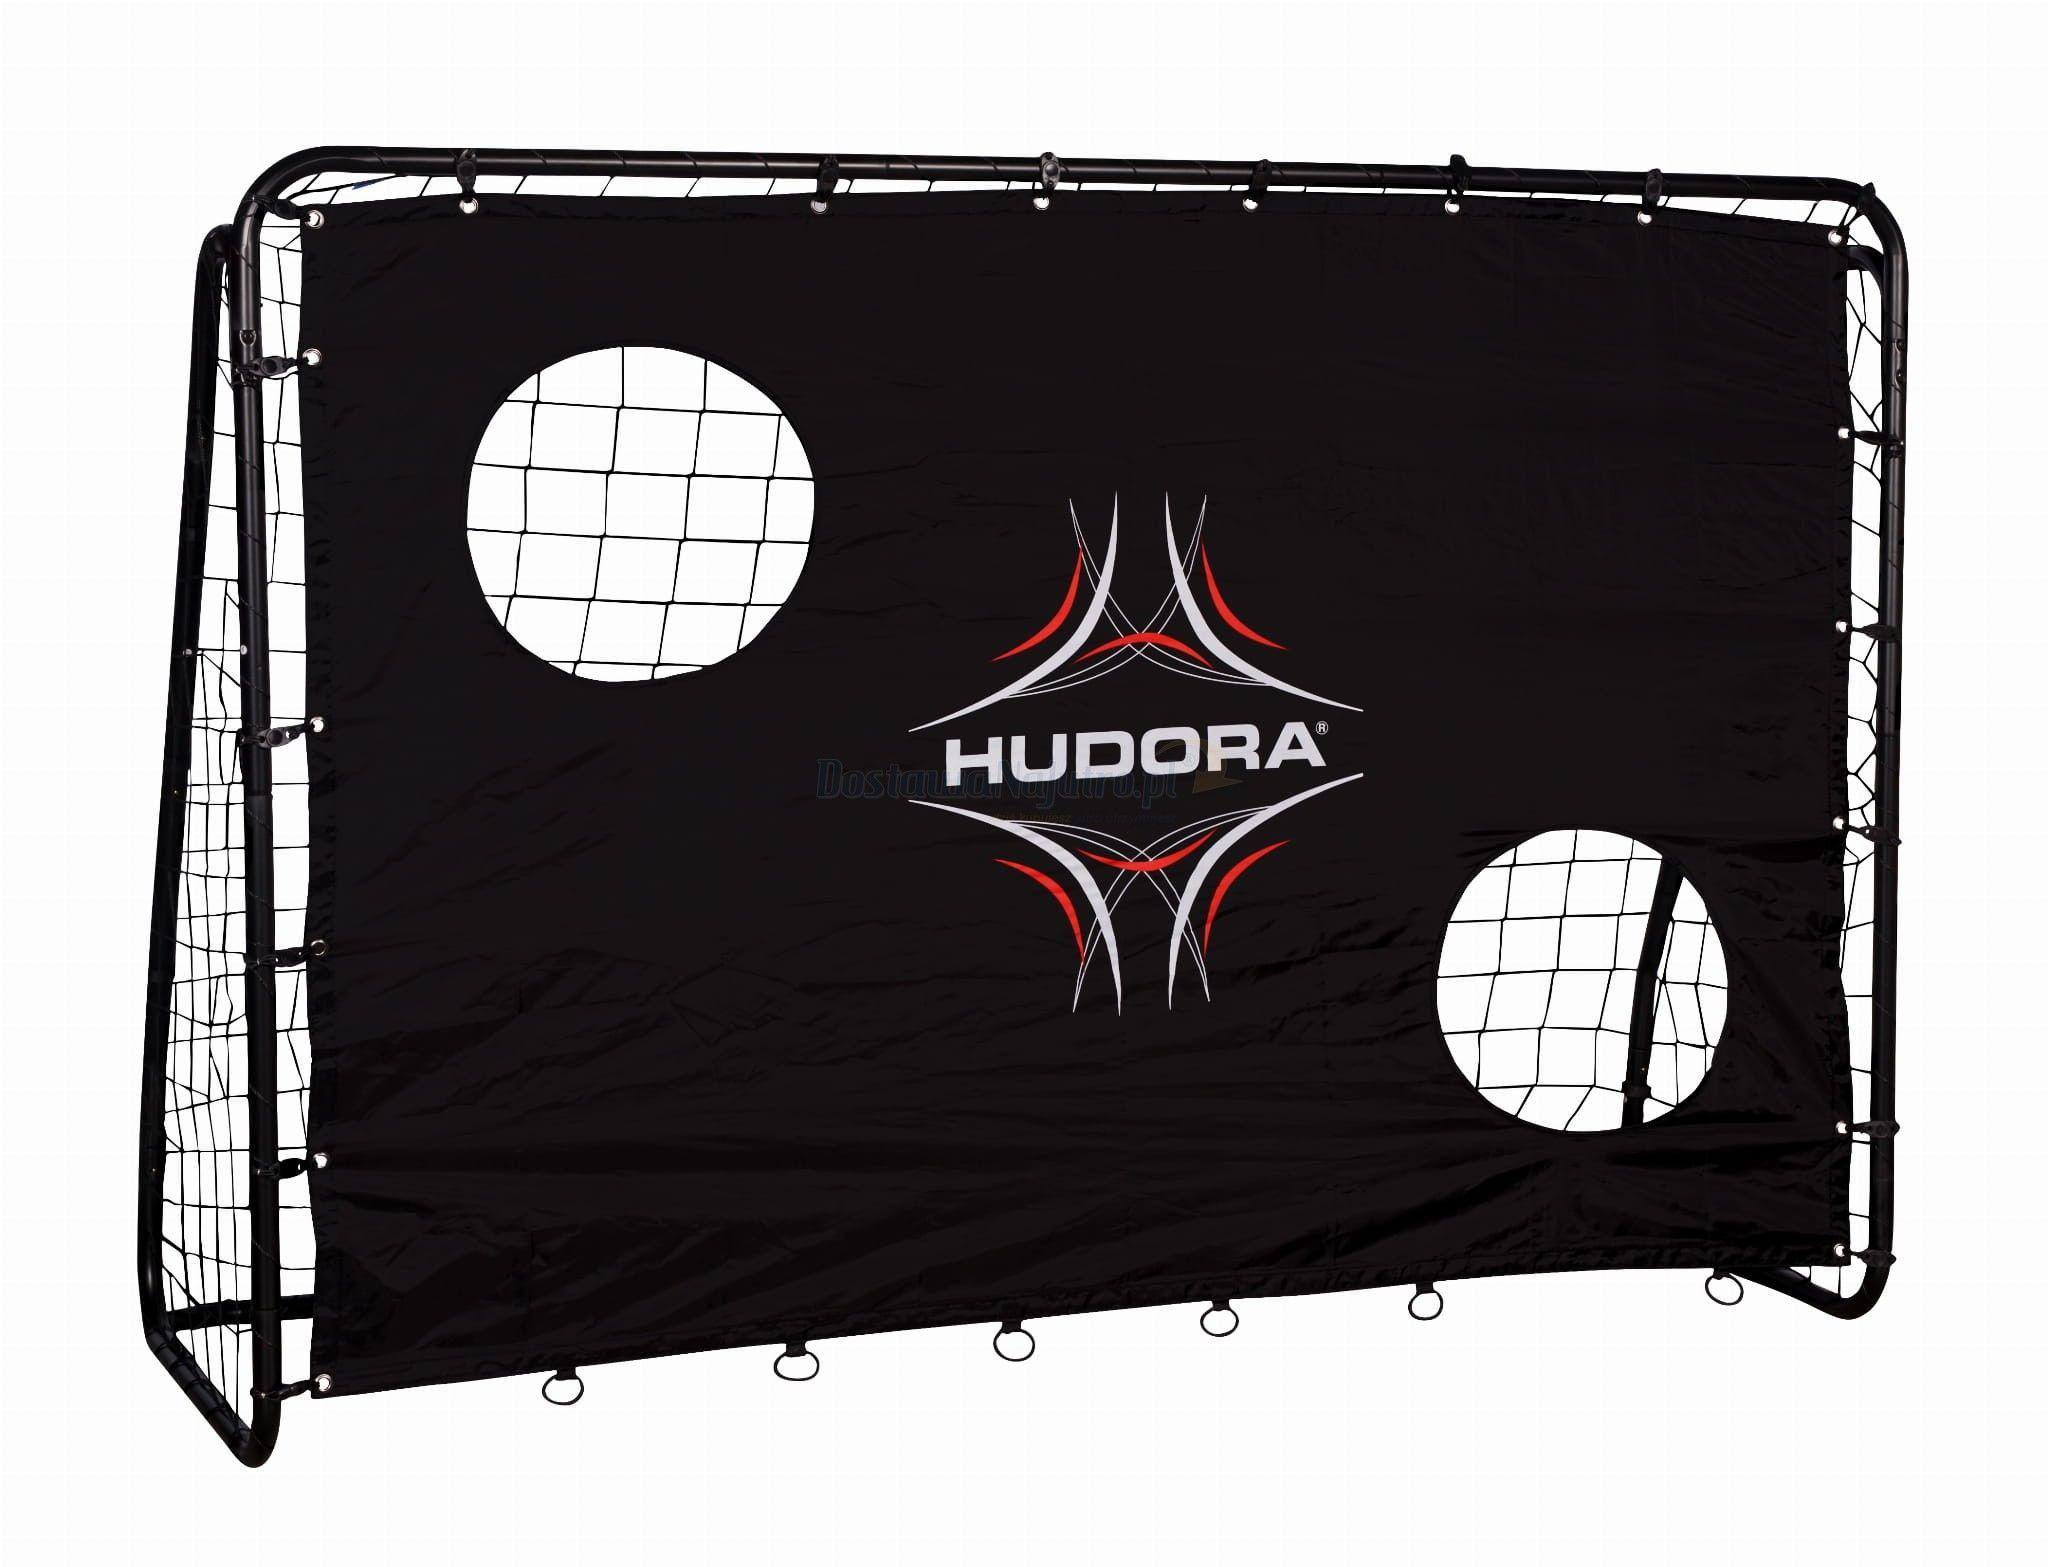 Bramka piłkarska FREEKICK HUDORA + mata 213 x 152 cm czarna